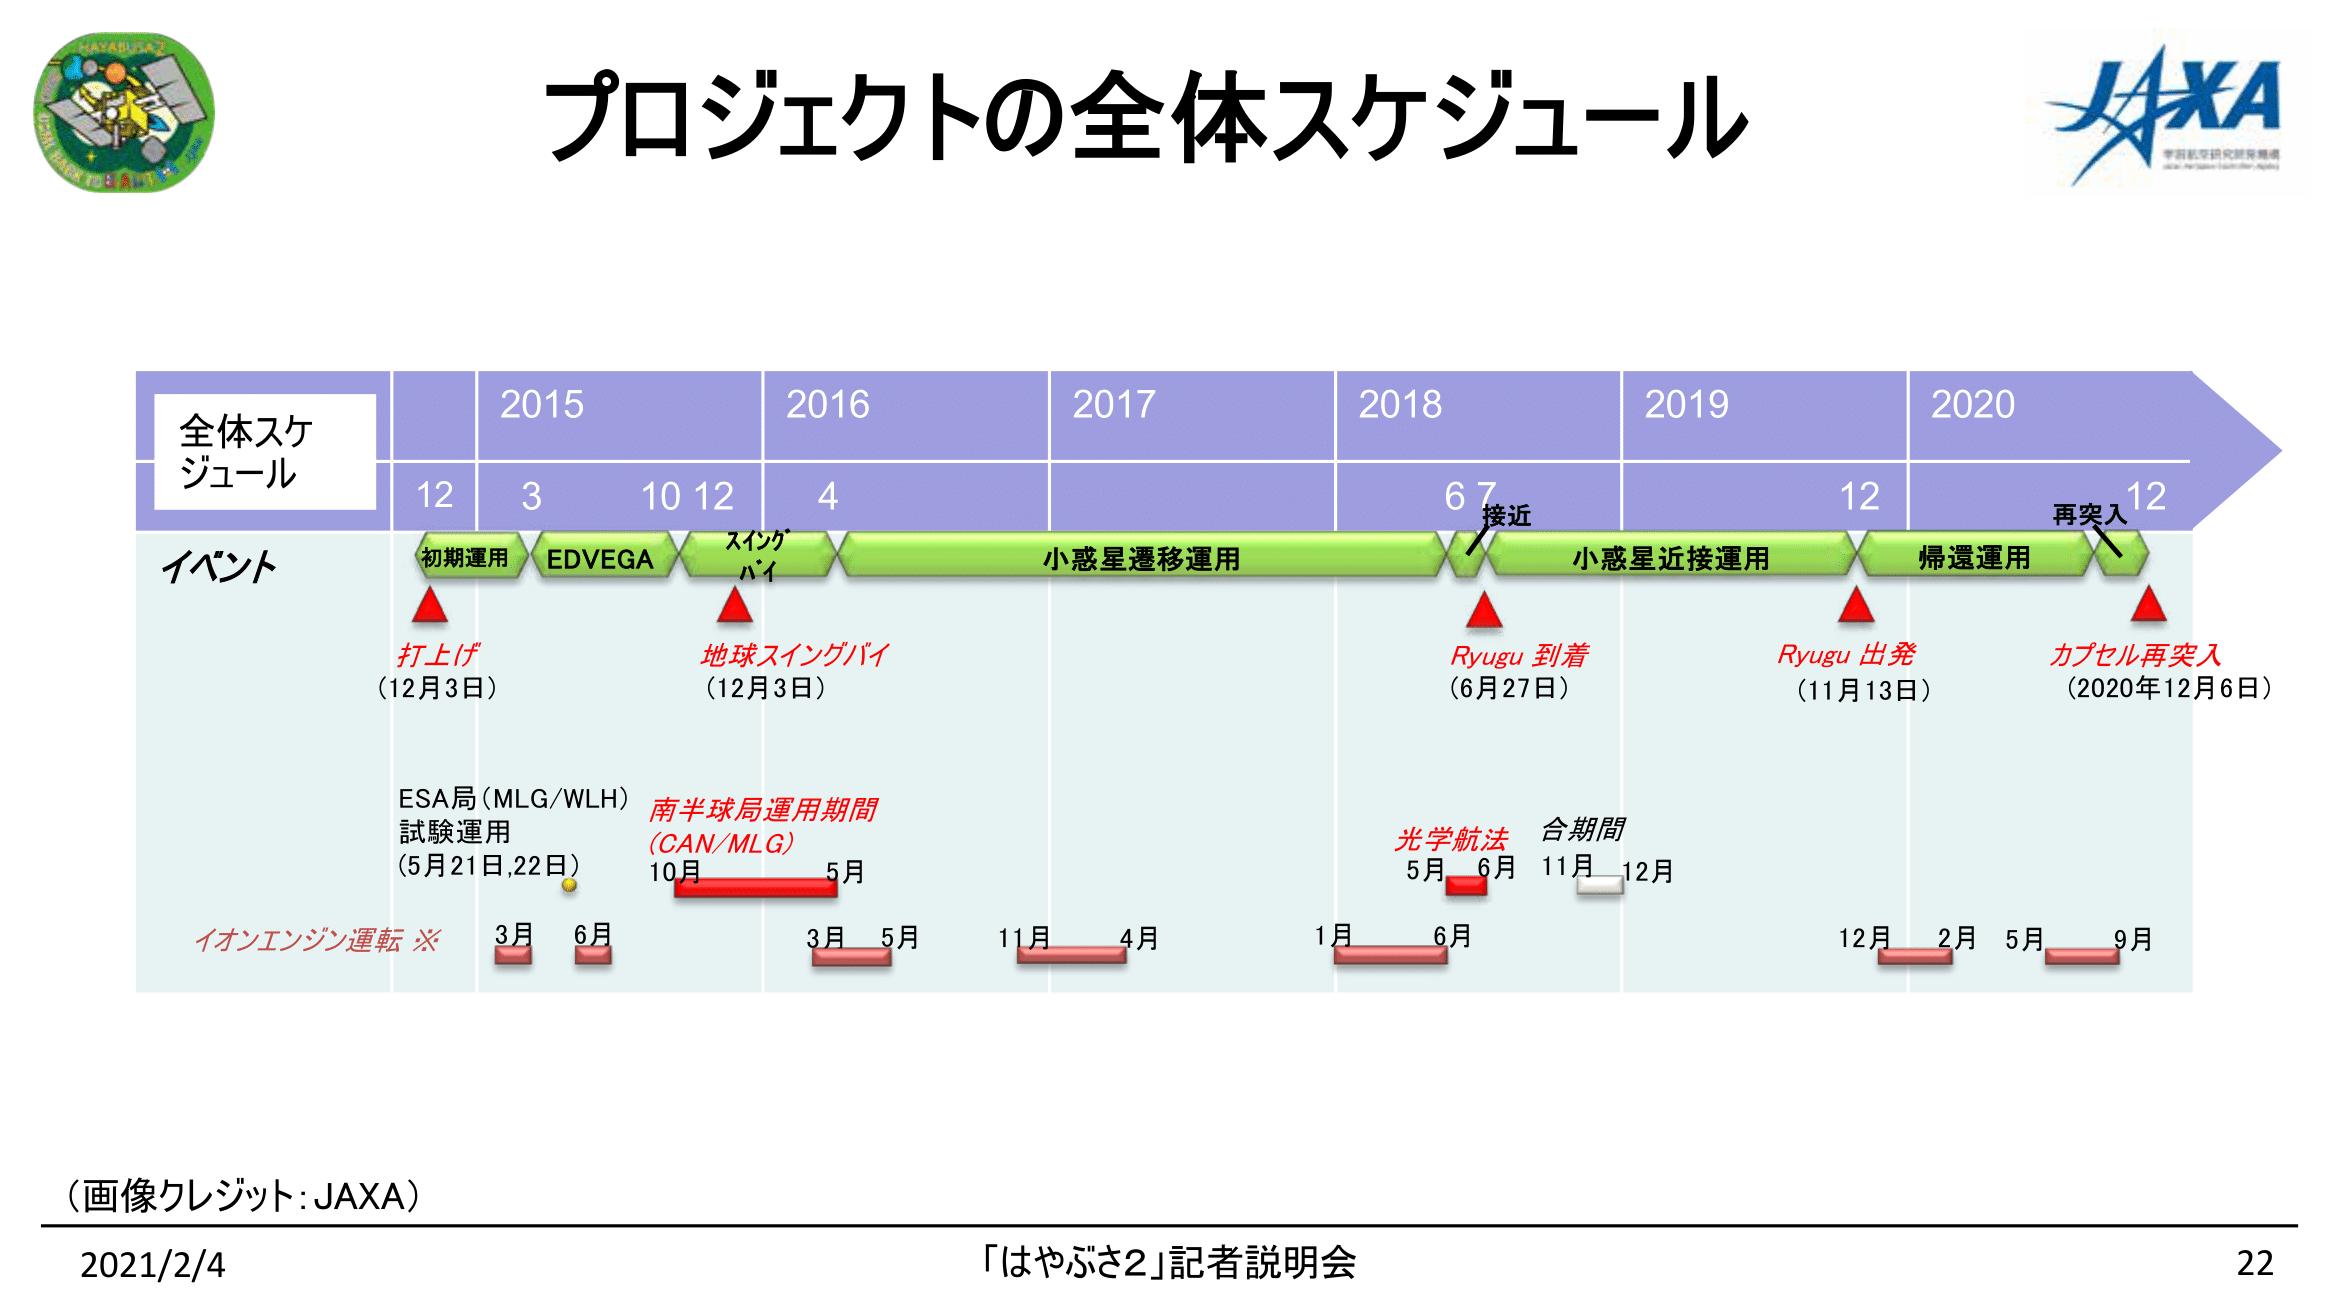 f:id:Imamura:20210204134457p:plain